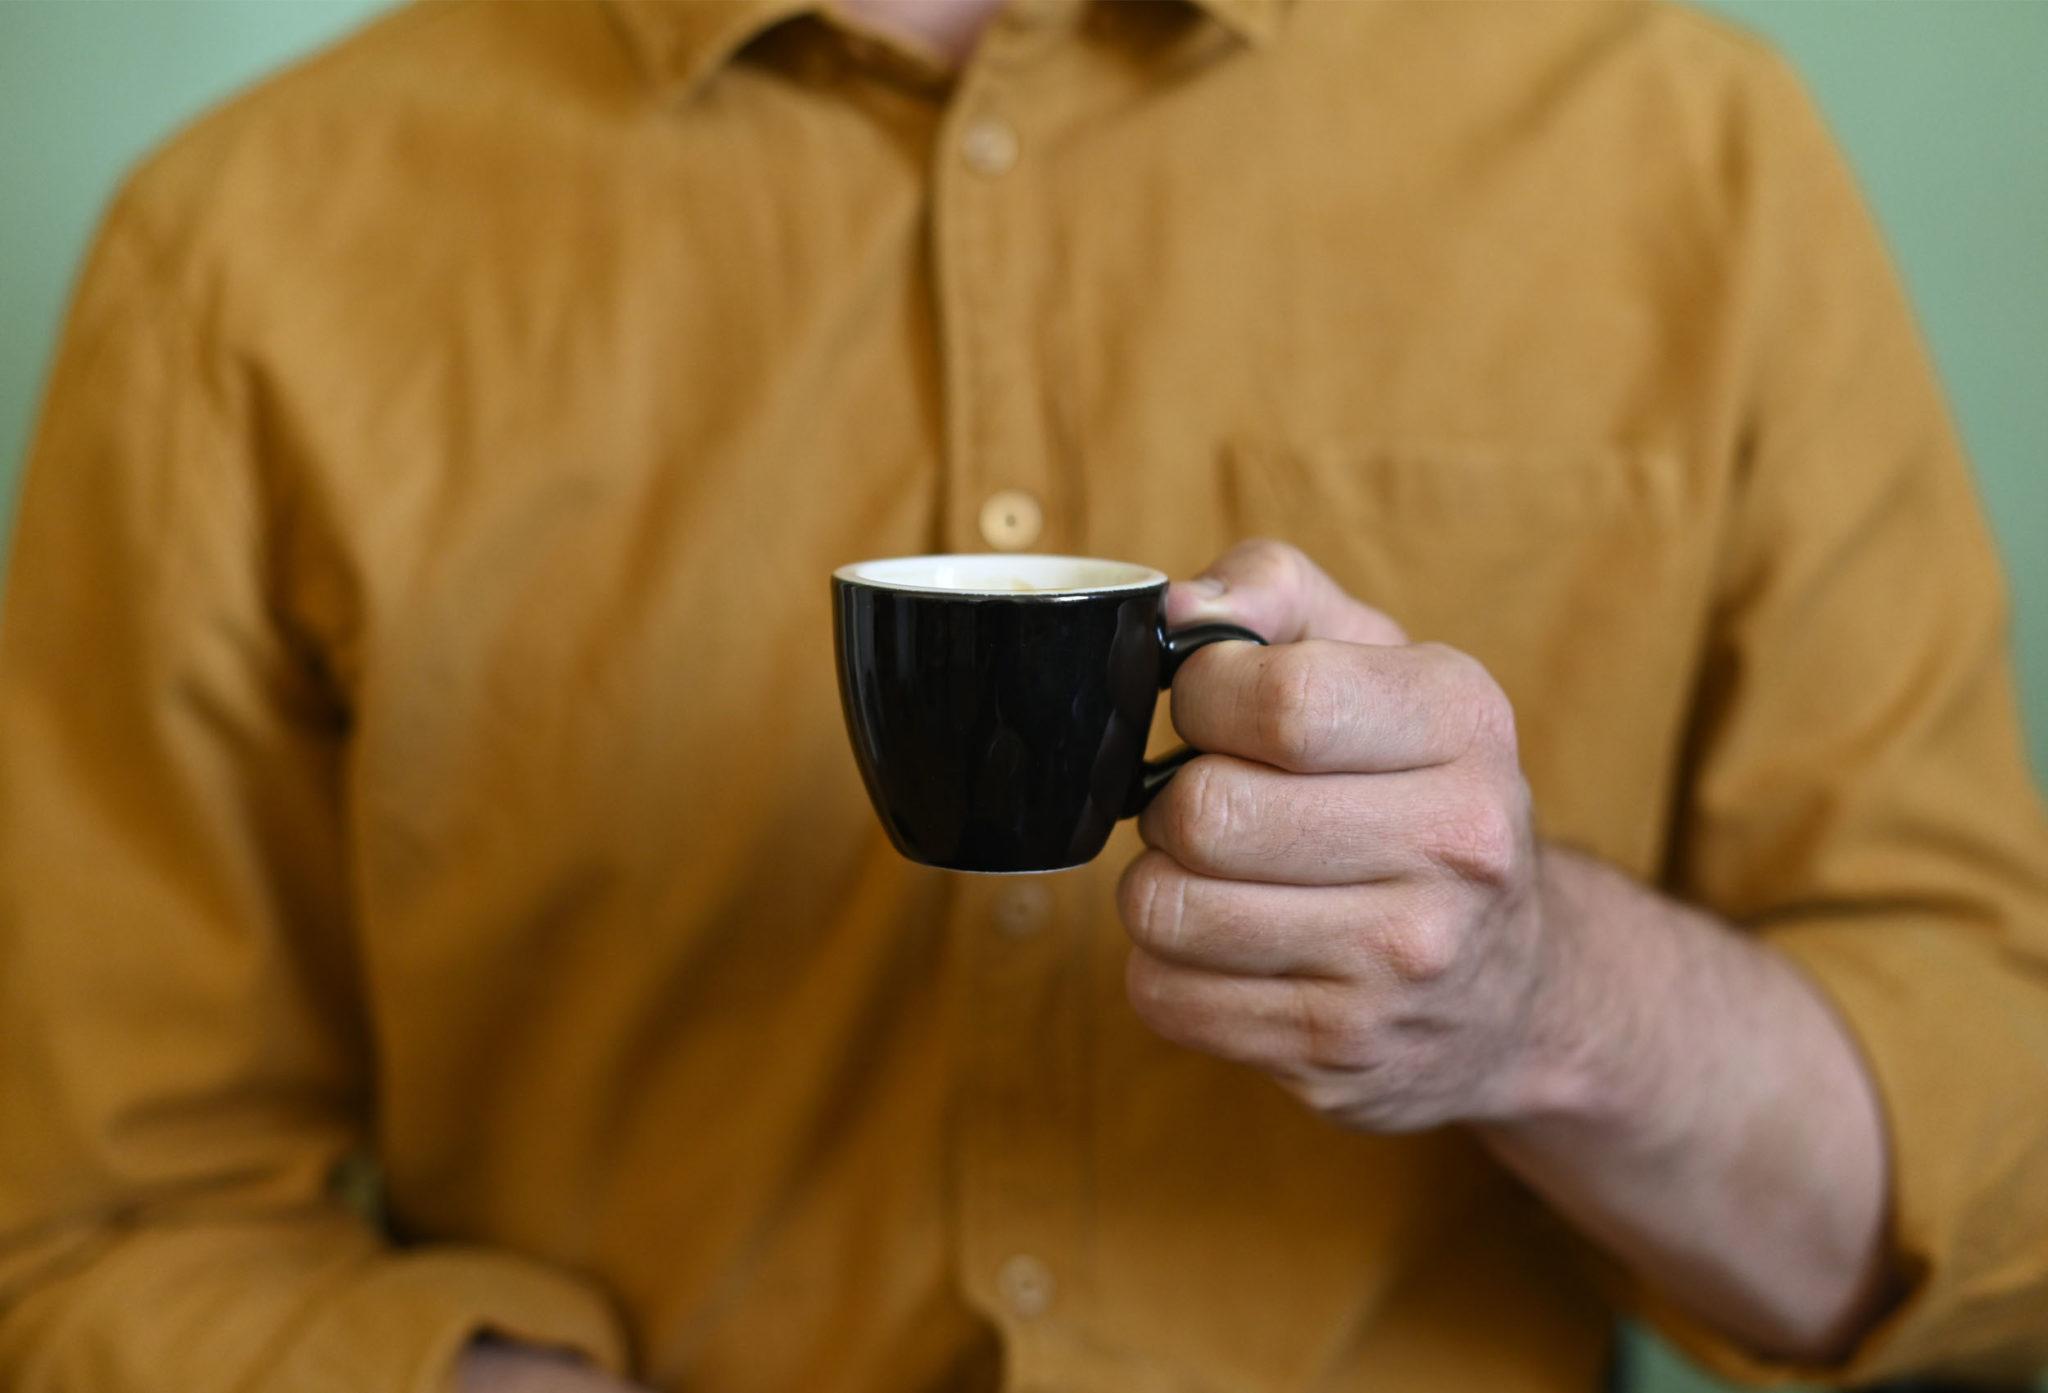 man holding a black espresso cup